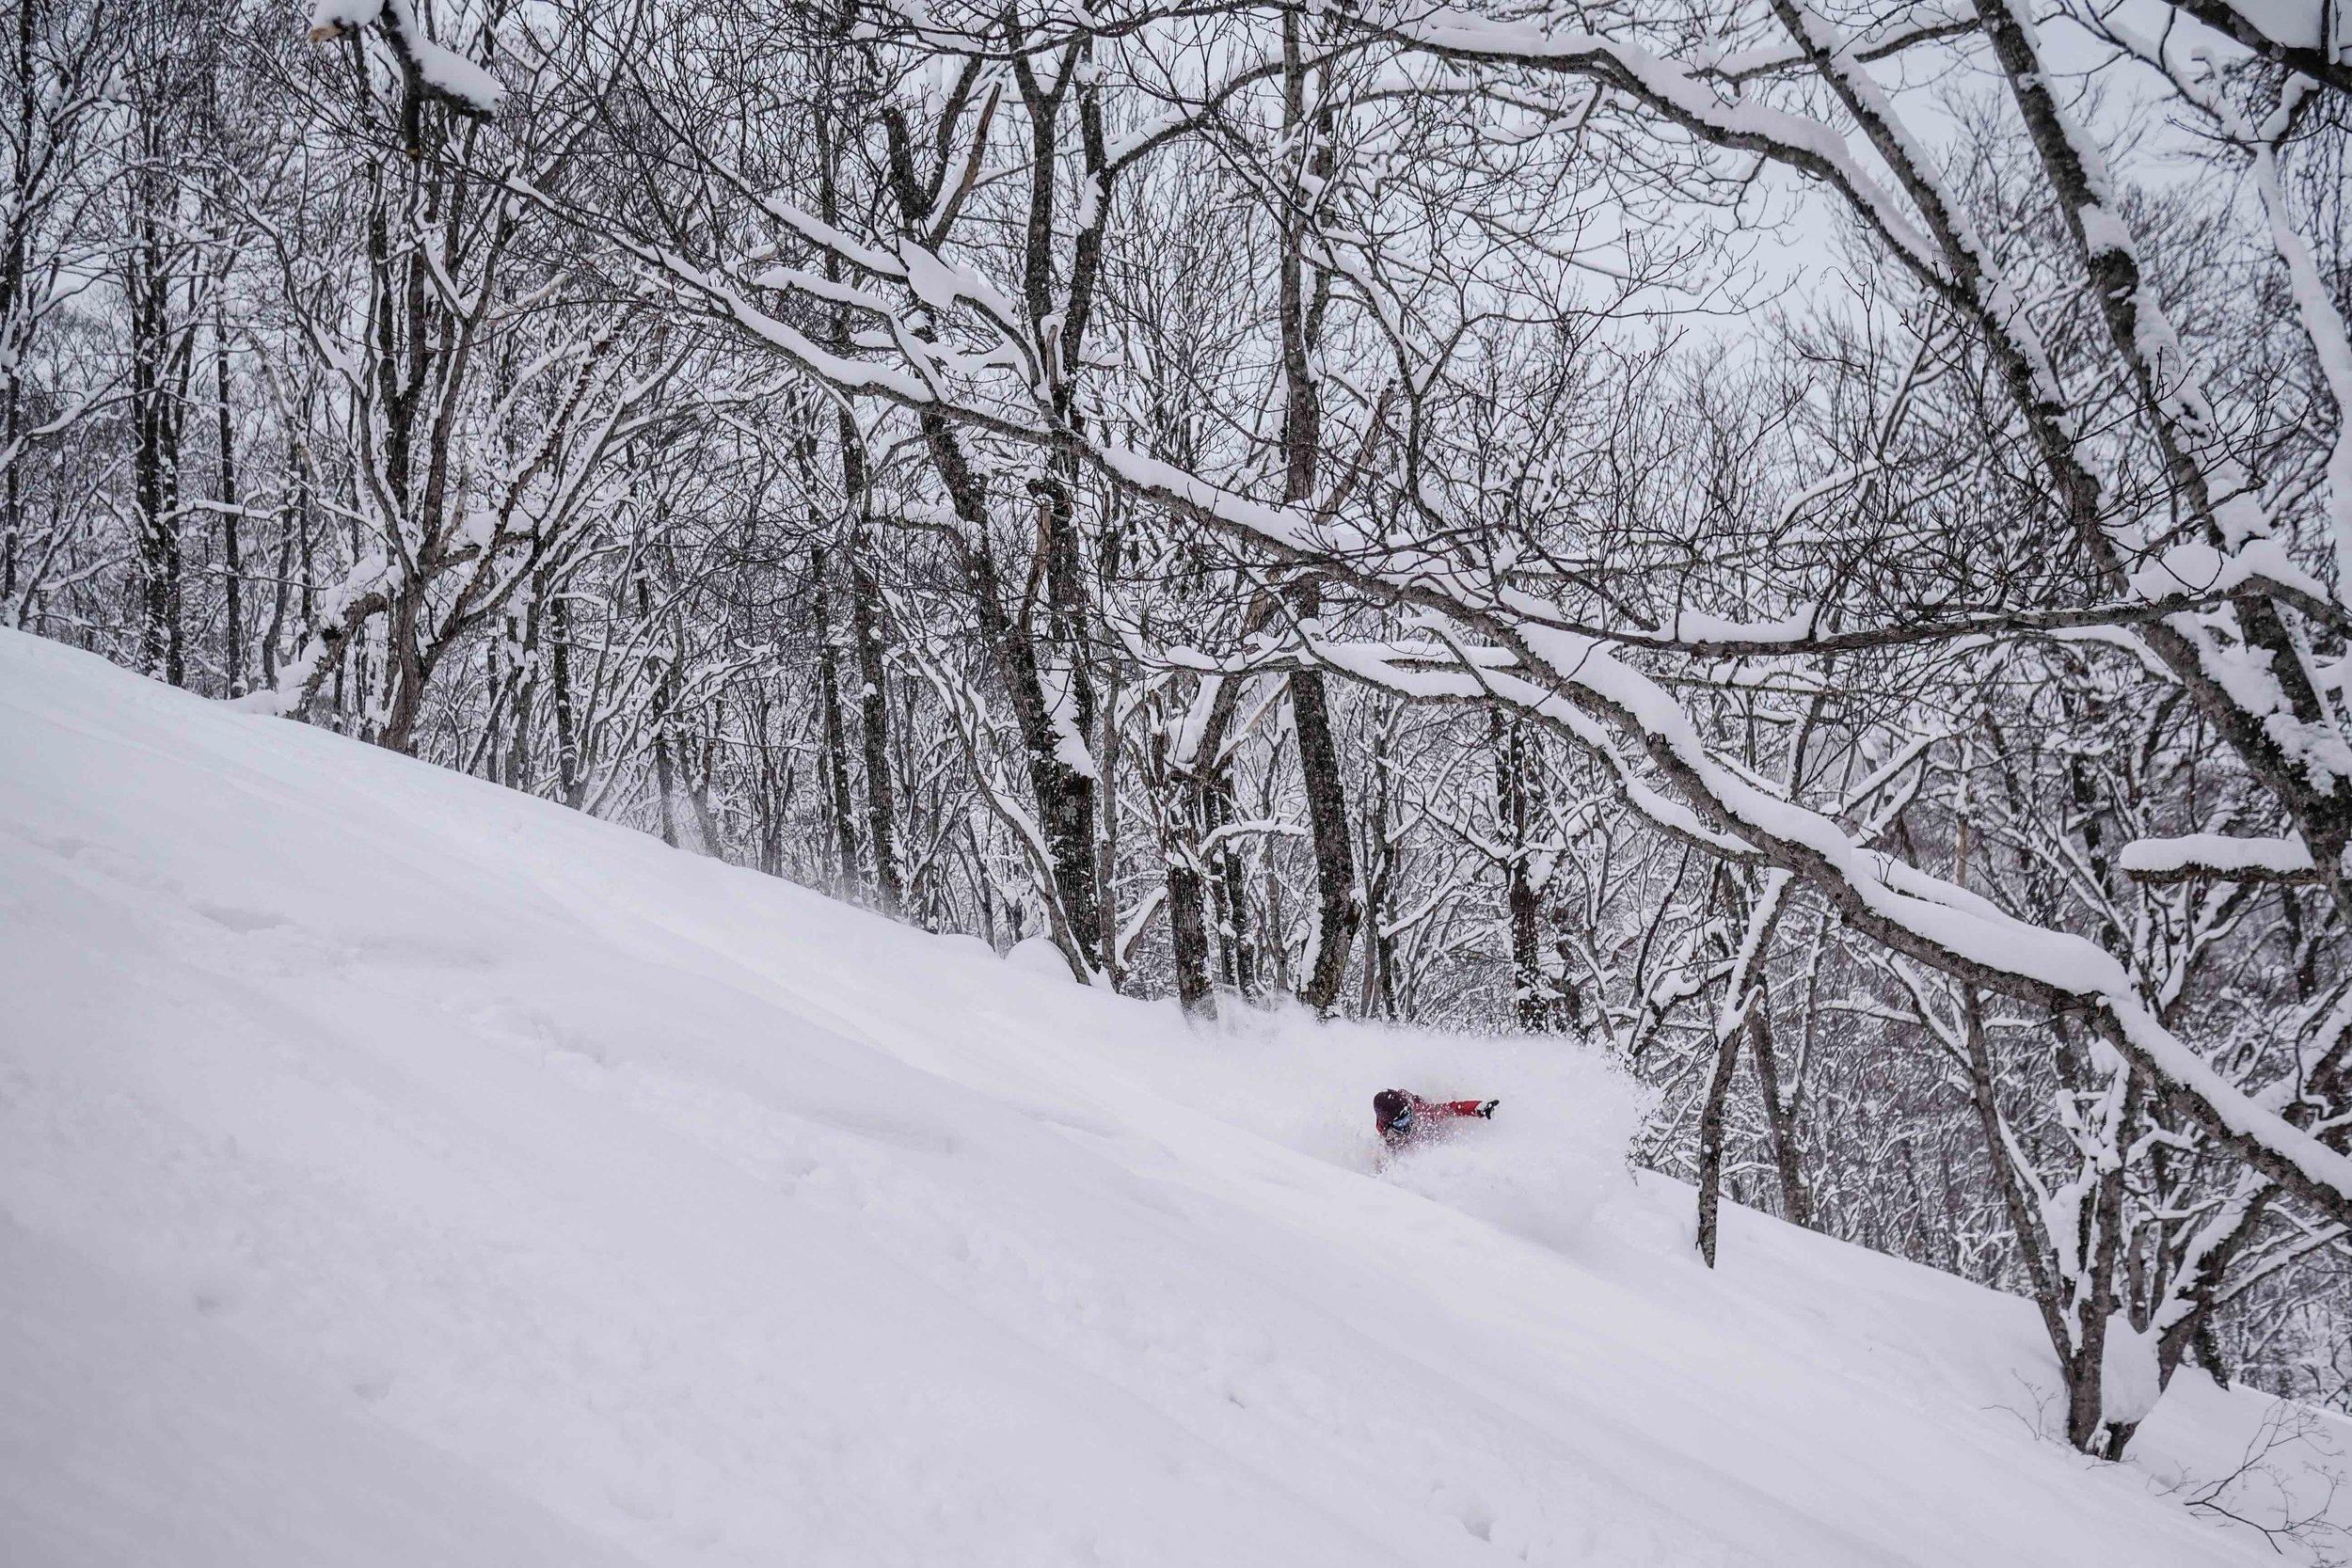 BPRSNT CHANELLE SLADICS SNOWBOARDING JAPAN POWDER 5.jpg